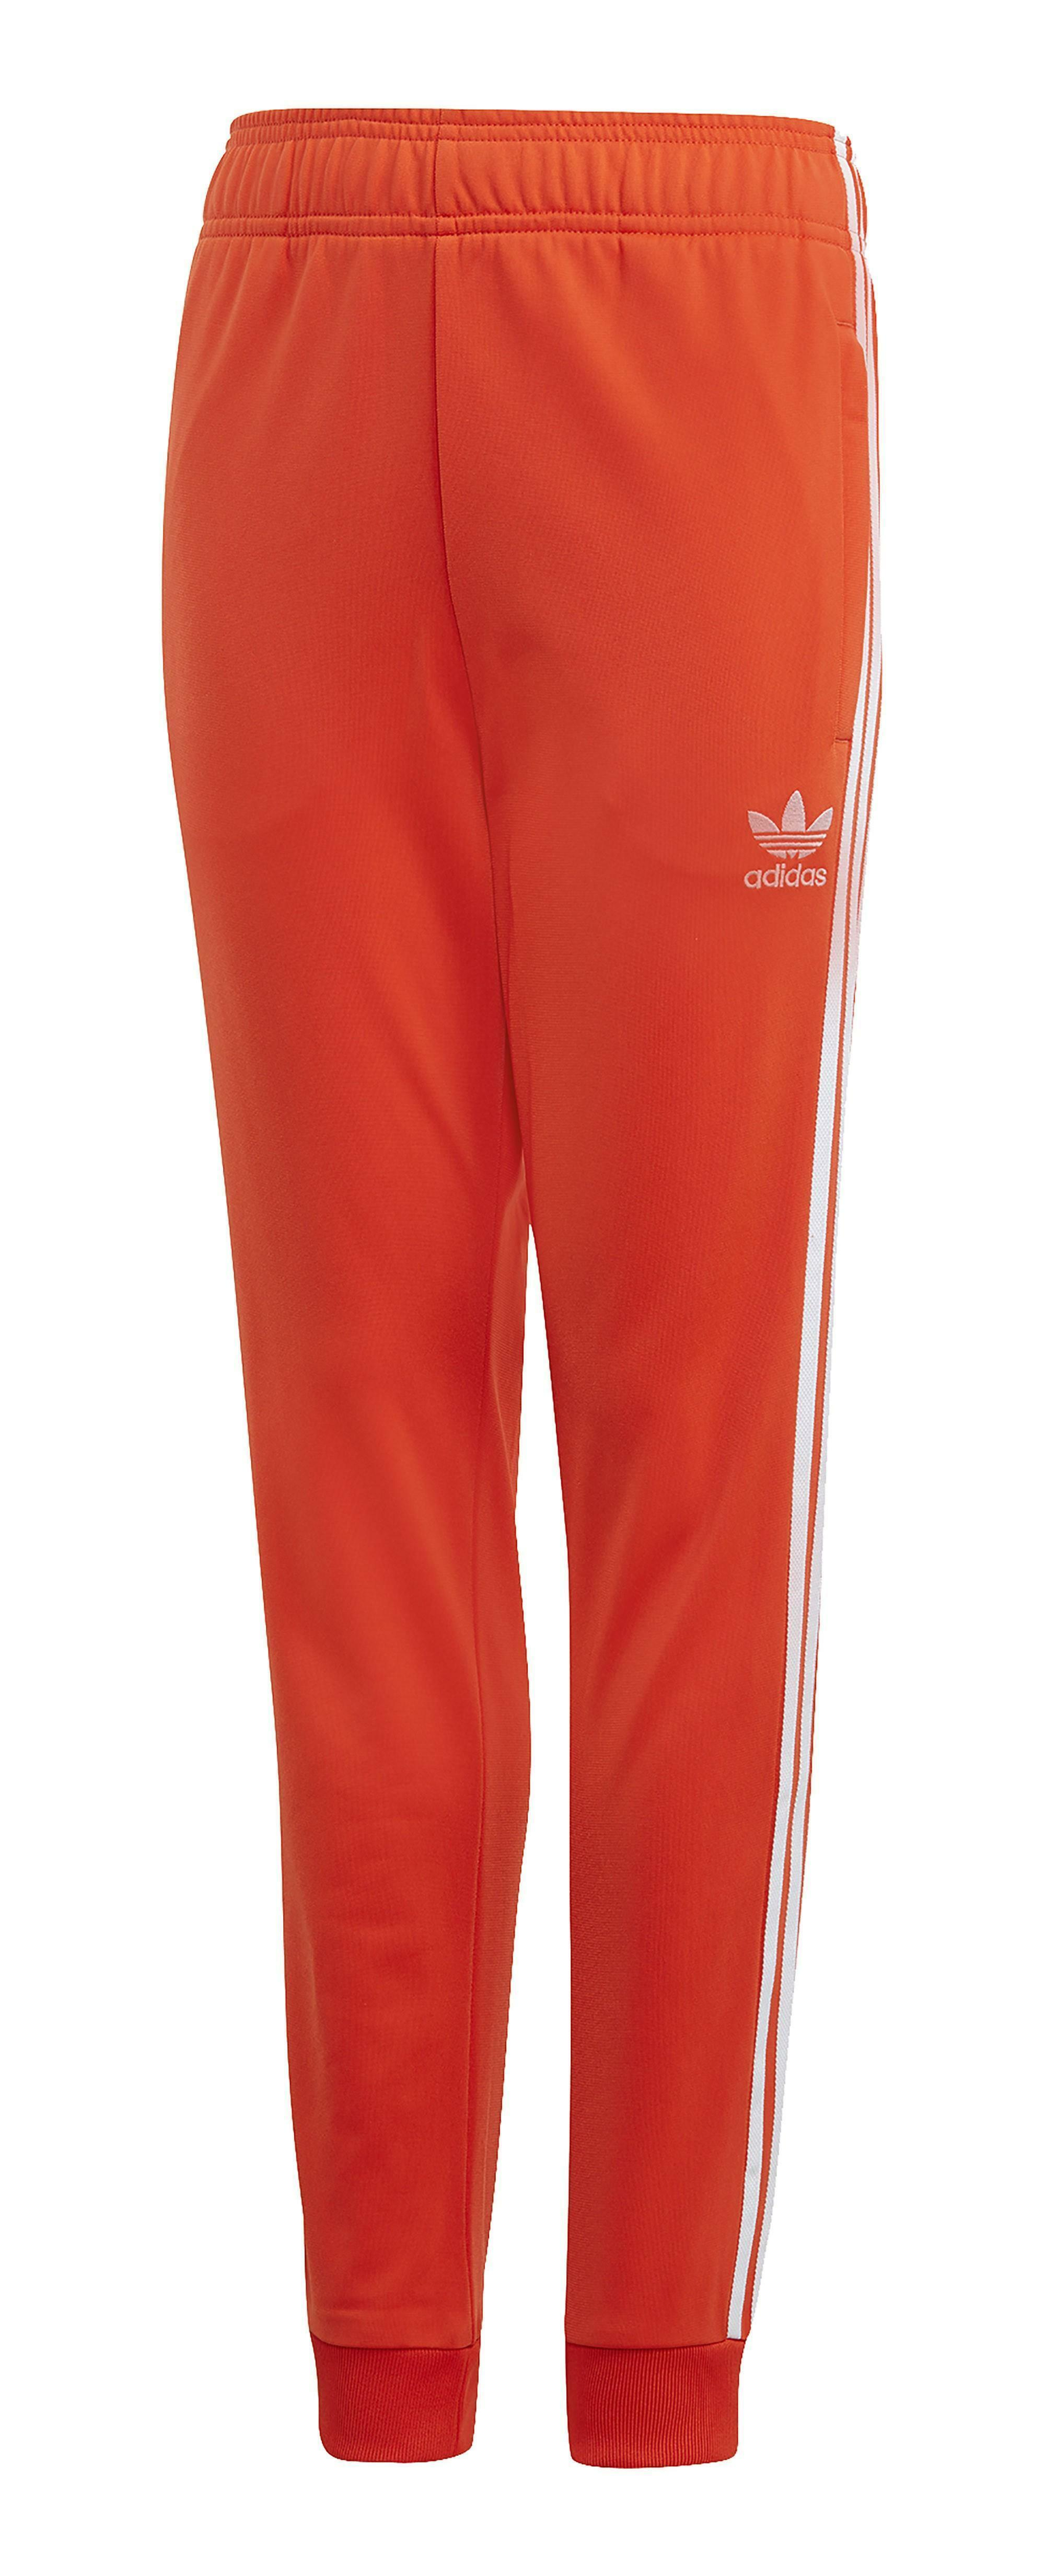 adidas adidas superstar pantalone bambino arancione dv2881